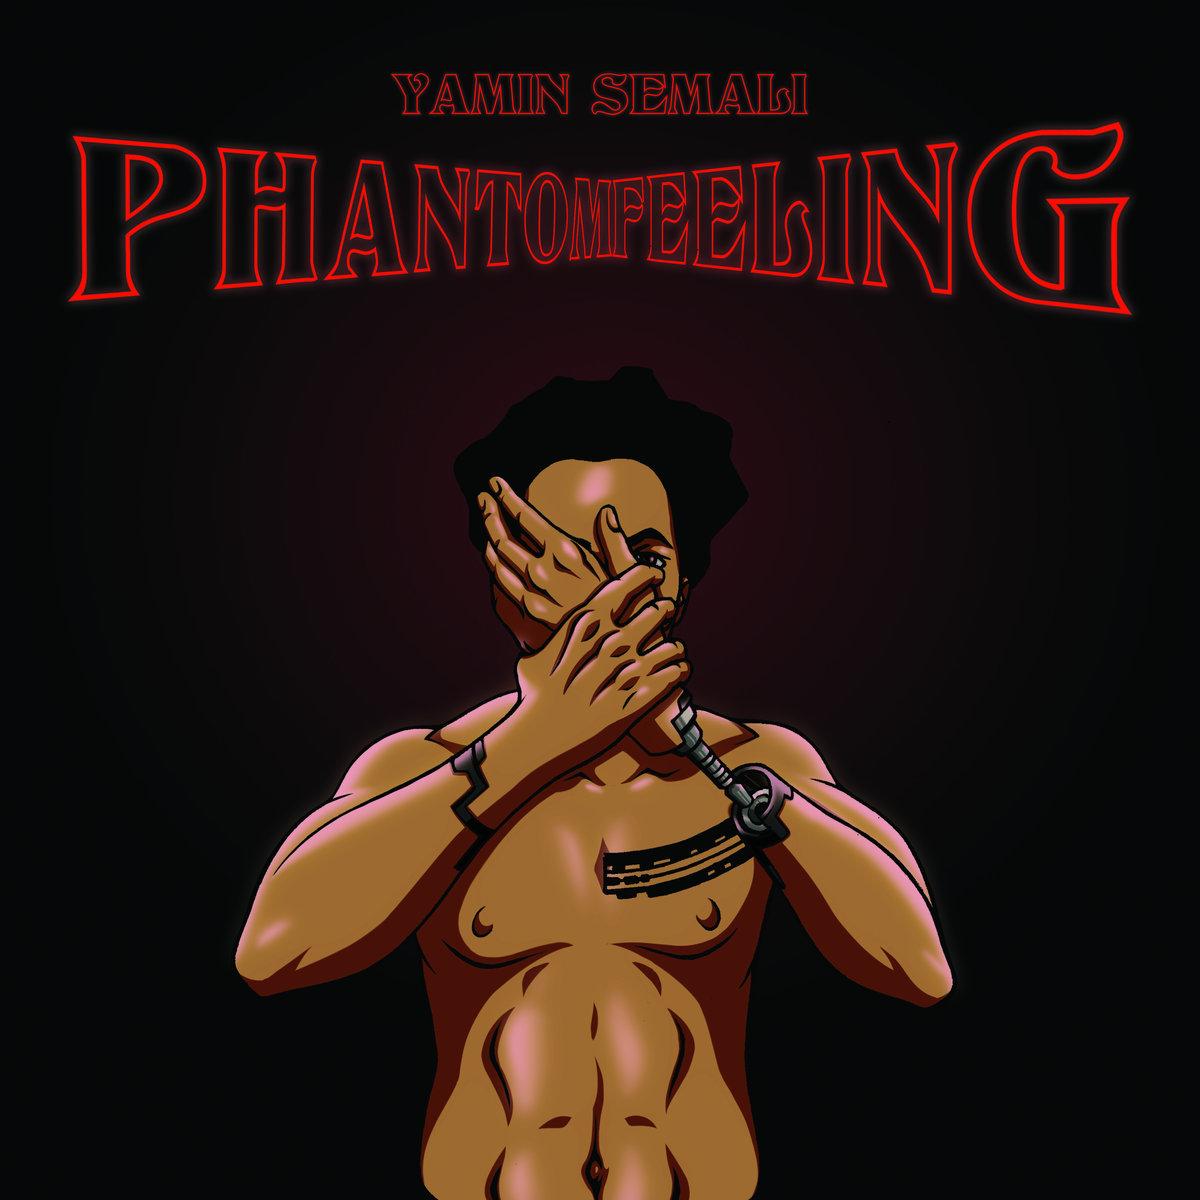 Phantom Feeling